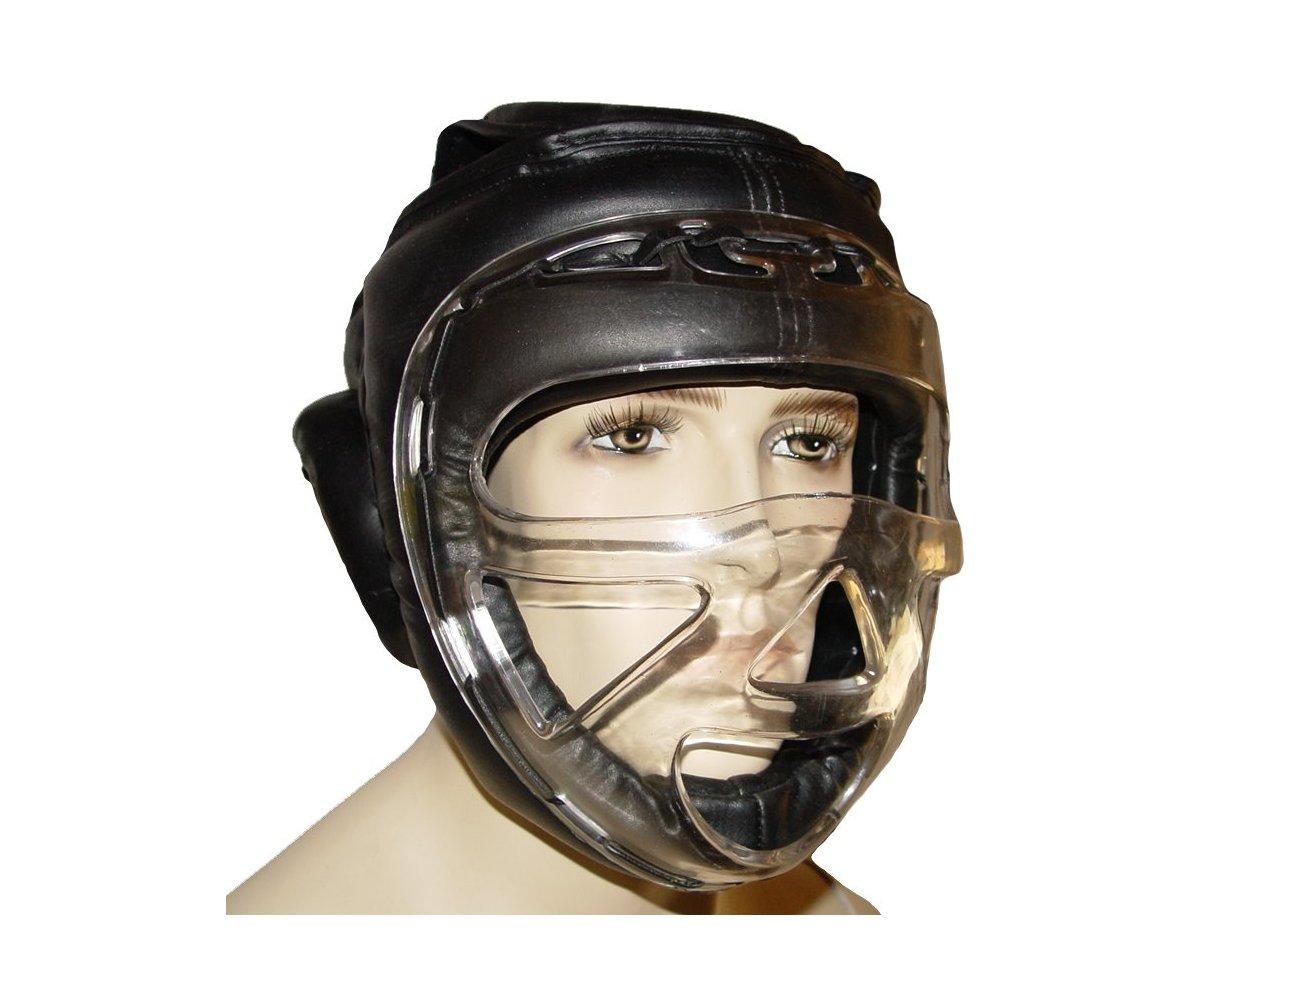 Kampfsport MMA usw Brustschutz Econo Damen von Ju Sports XL XXS Hockey Gr